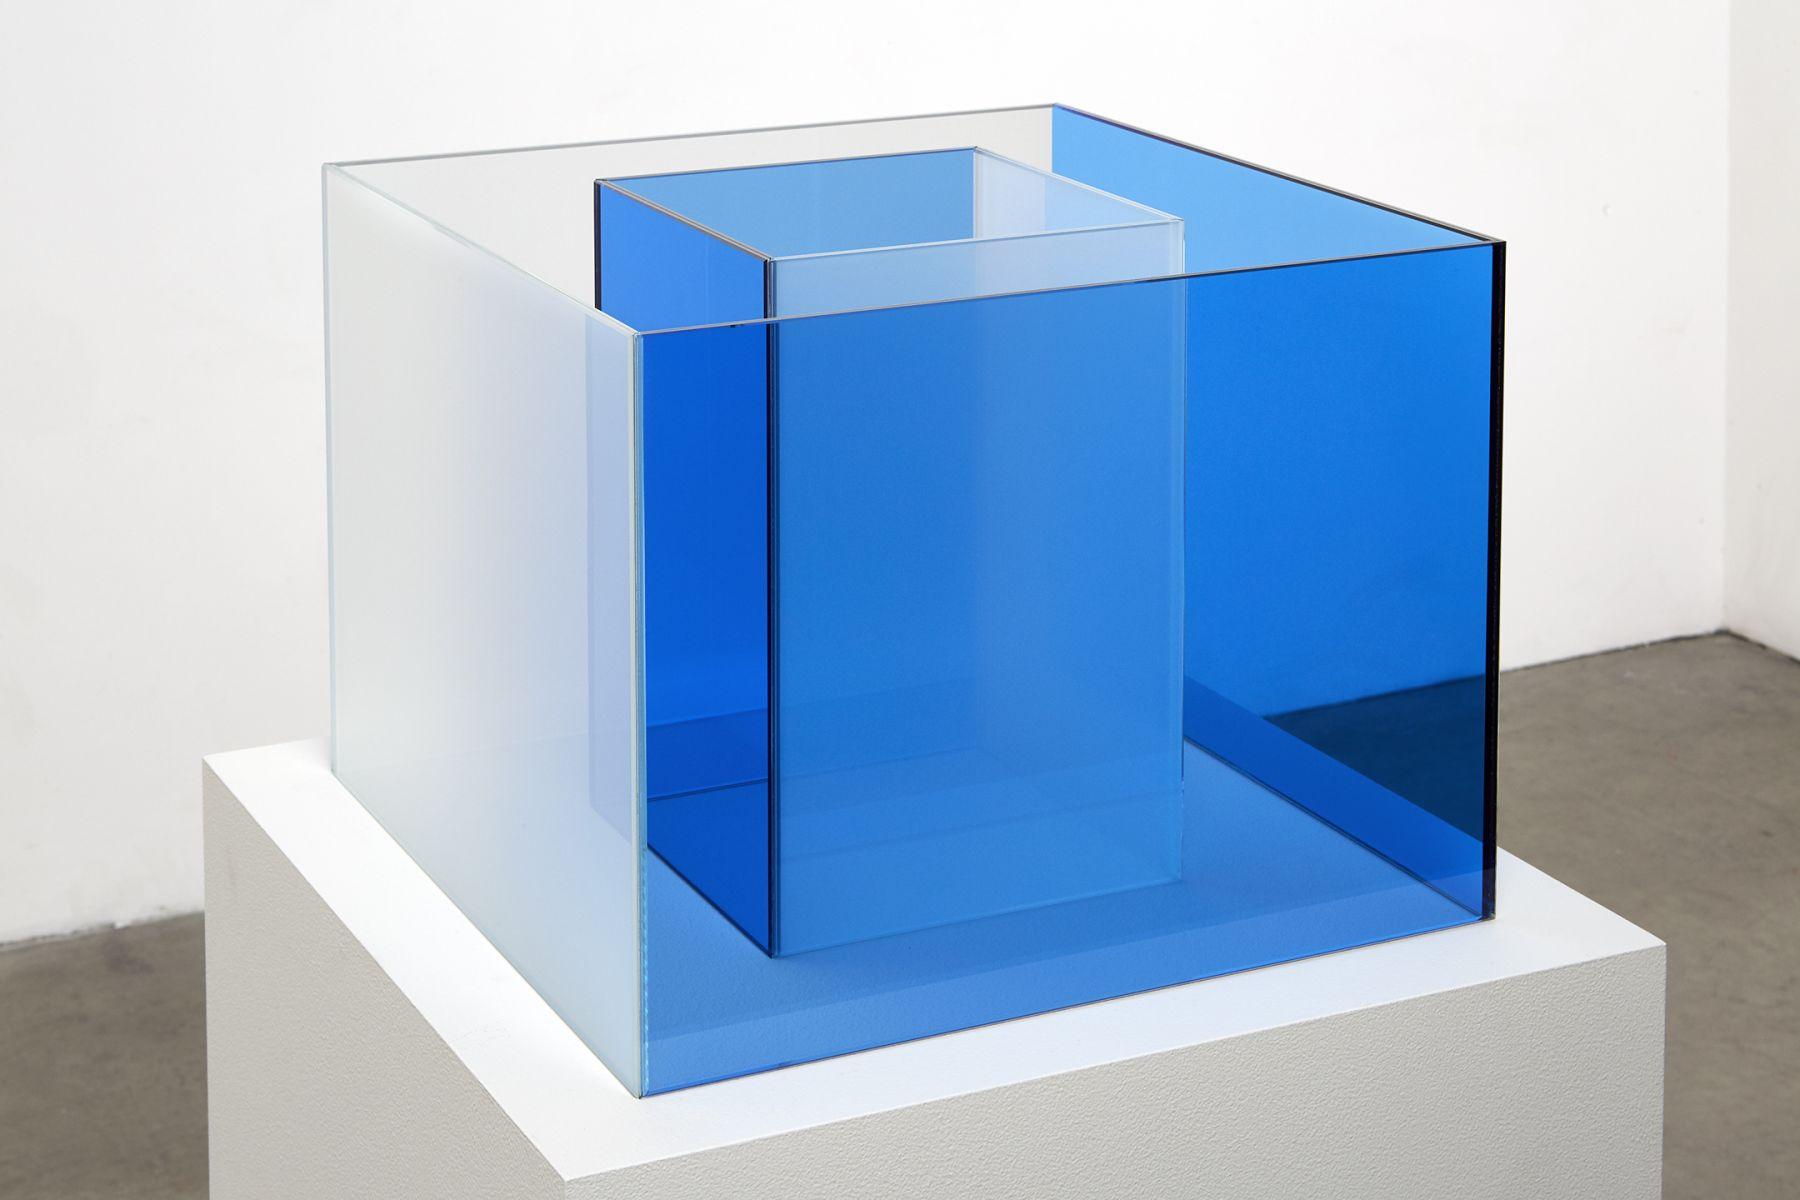 "ALT=""Larry Bell, Untitled Maquette (Cornflower Blue / True Sea Salt), 2018, Laminated glass"""